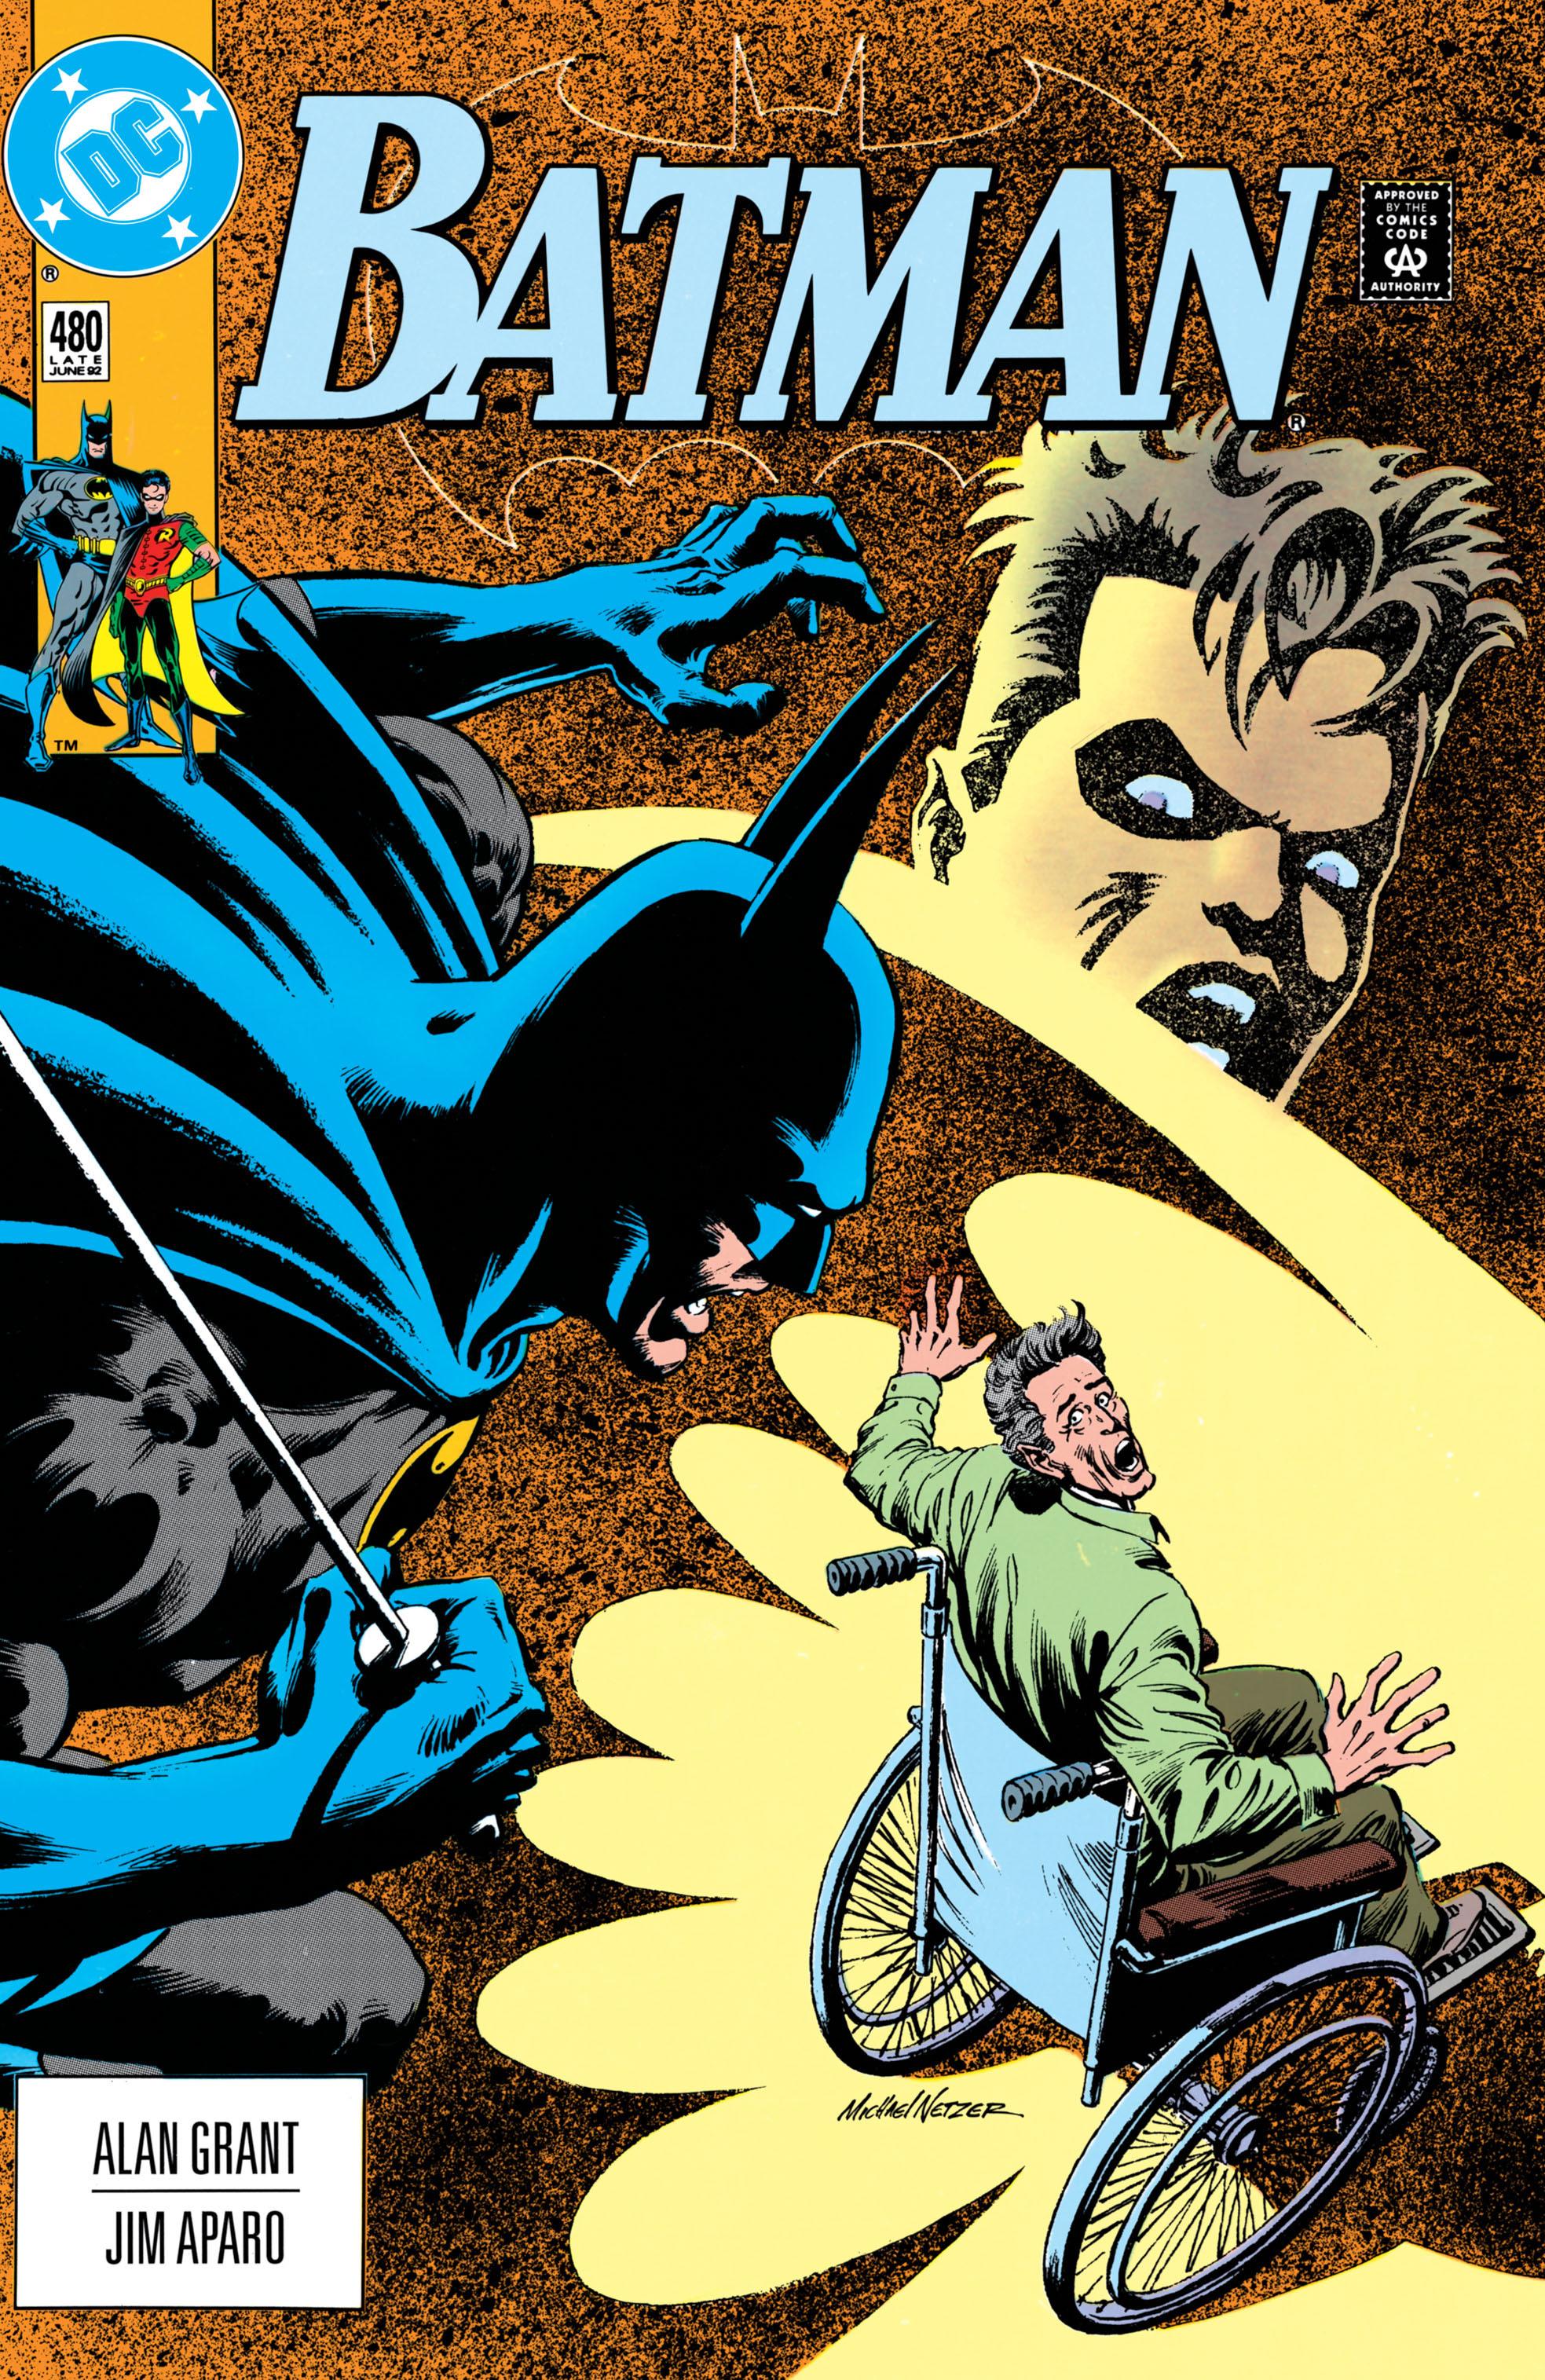 Batman (1940) #480, cover by Mike Netzer.